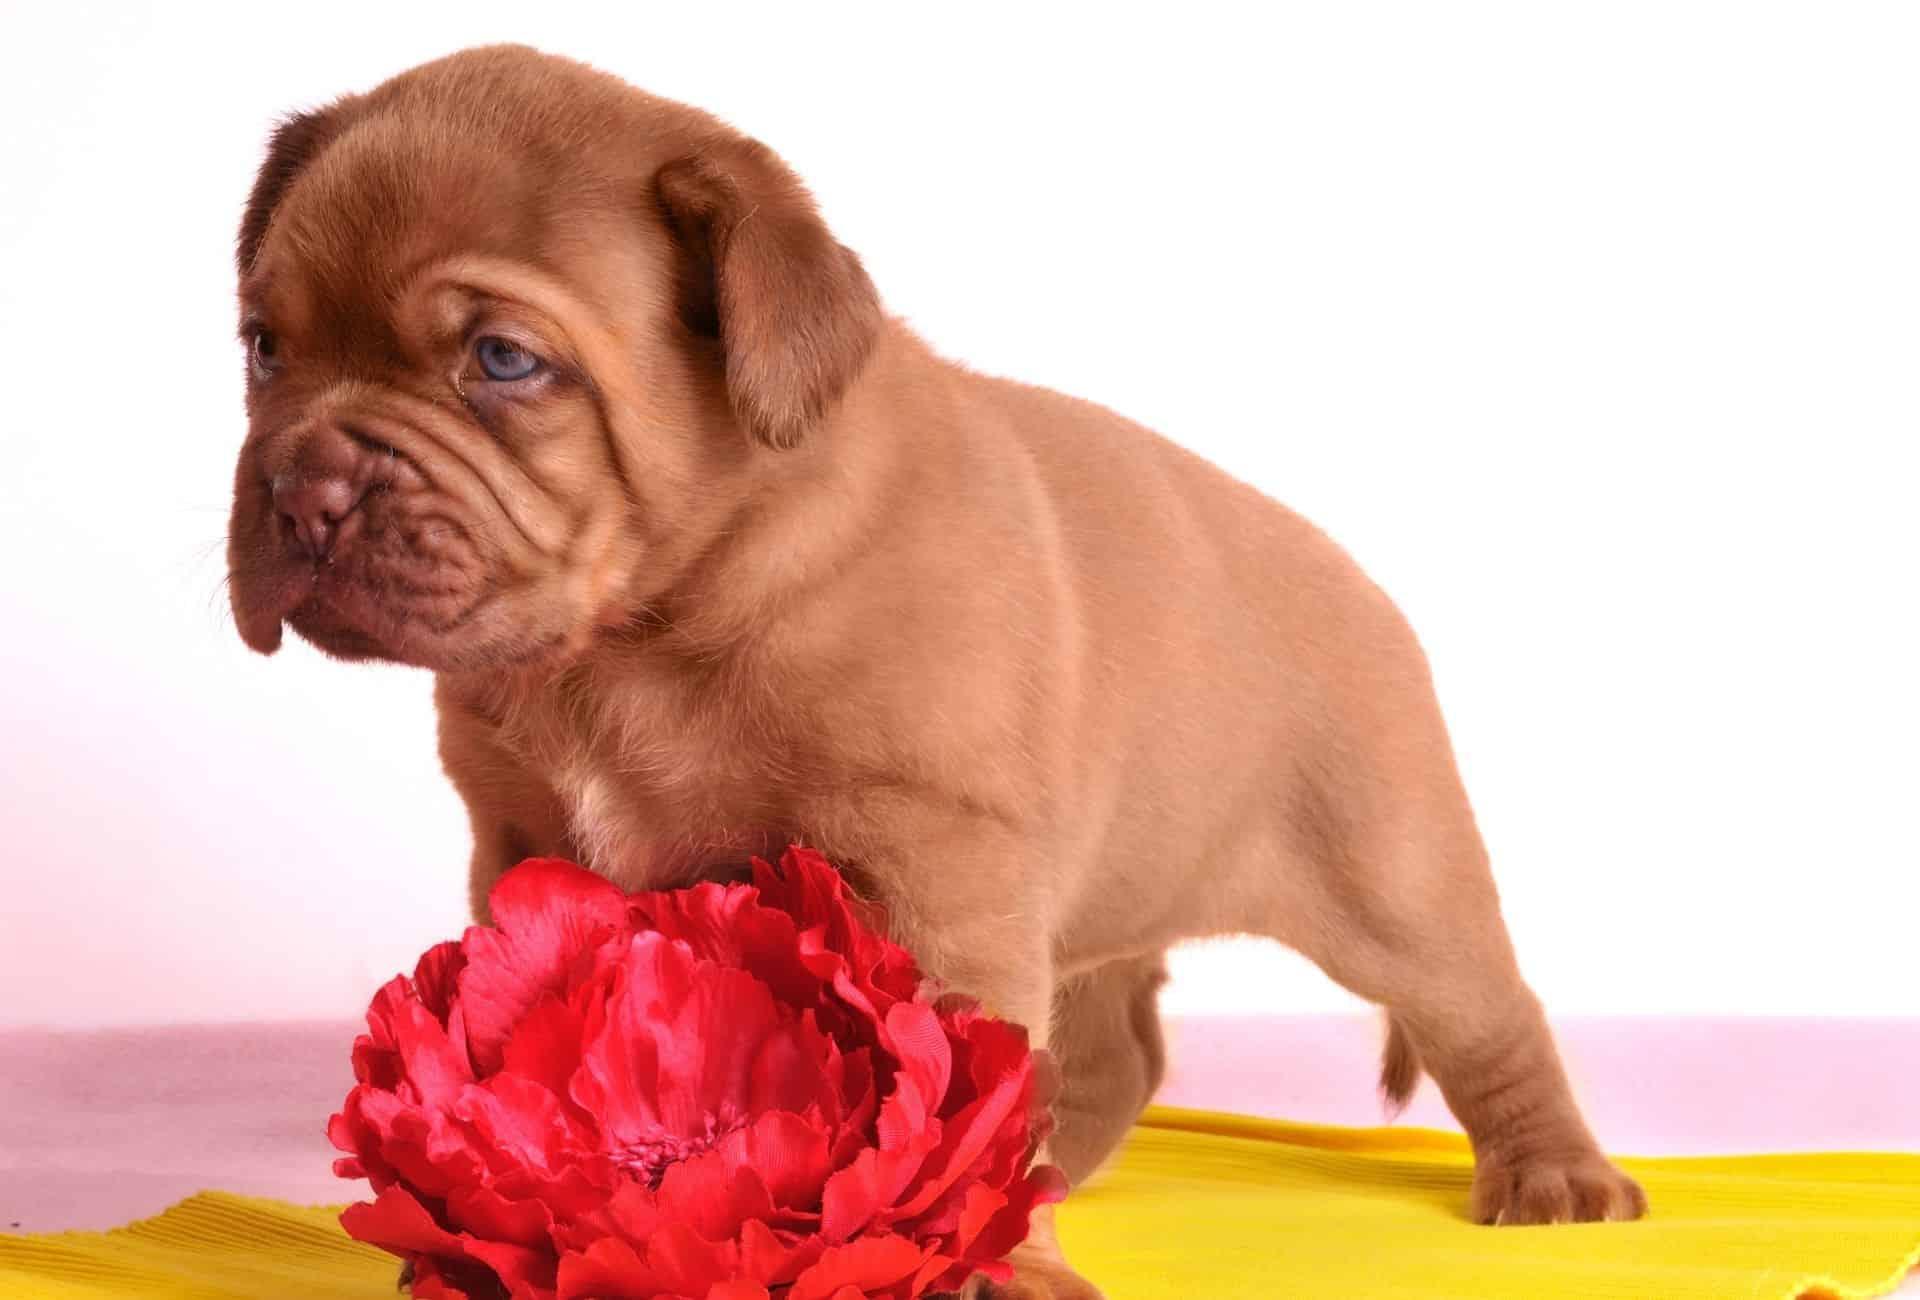 Cute Dogue de Bordeaux puppy on a yellow blanket.